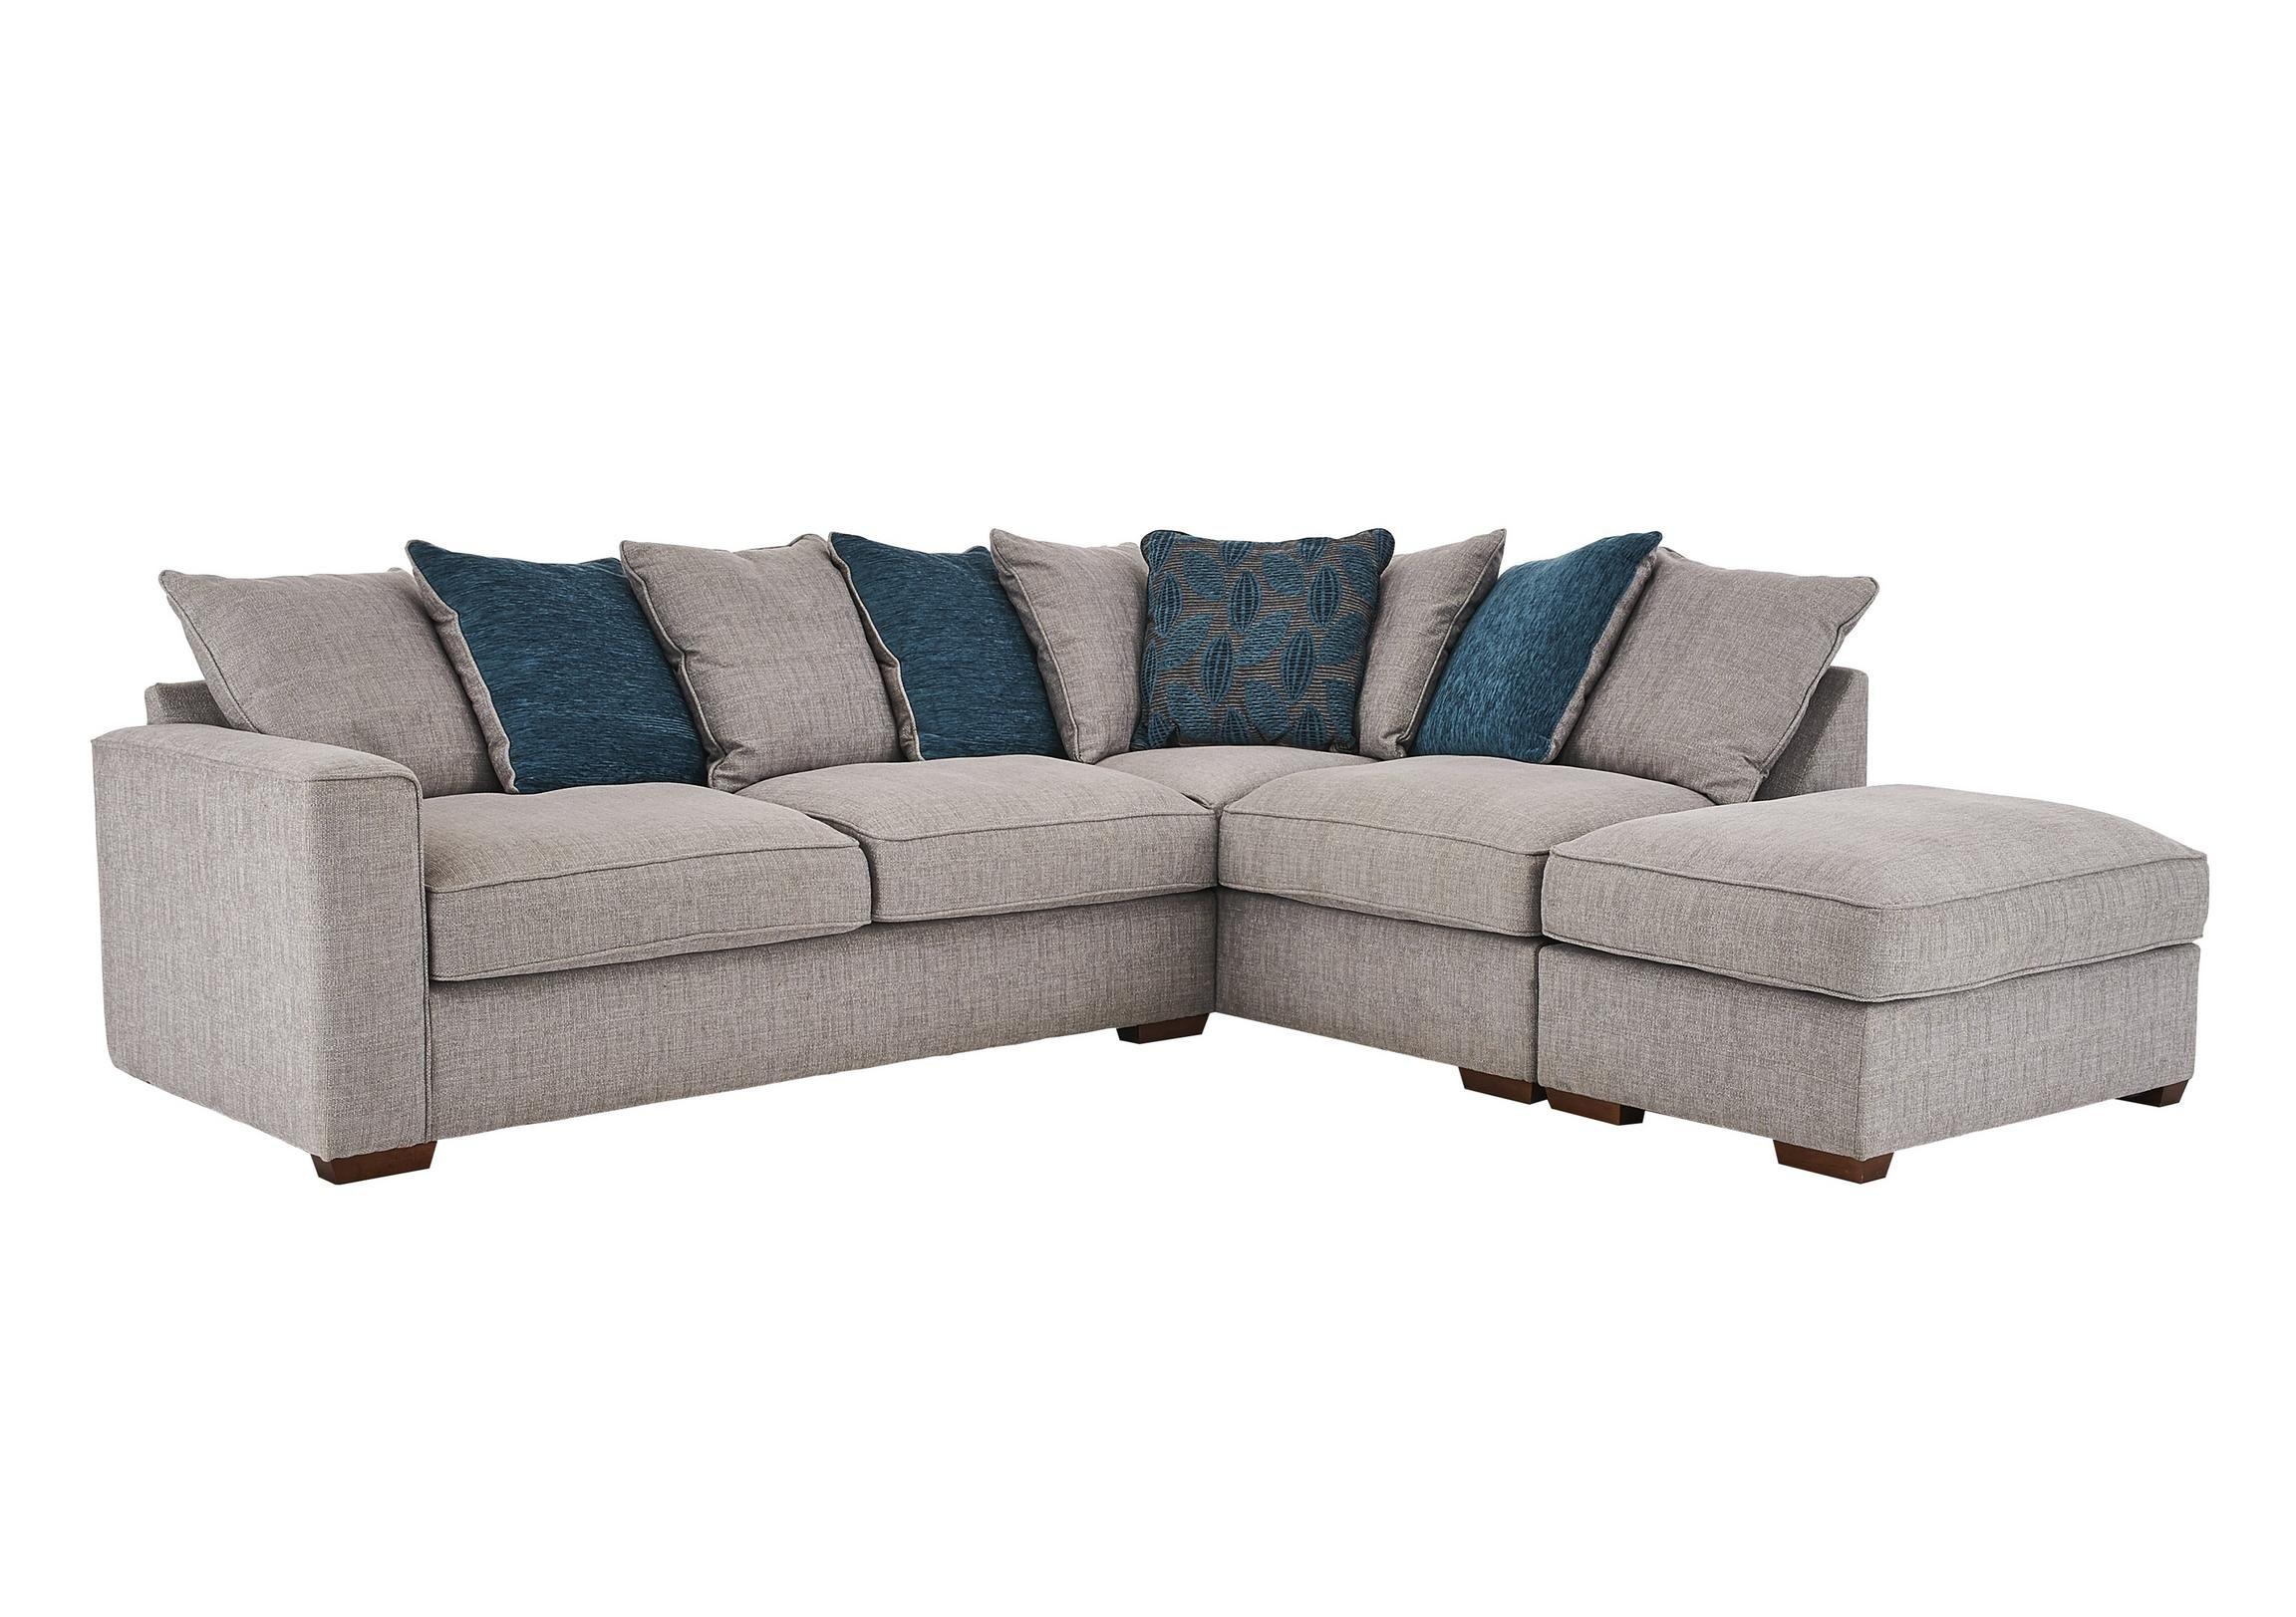 Dune Sofa Do Codziennego Spania Z Materacem Furniture Village Taraba Home Review